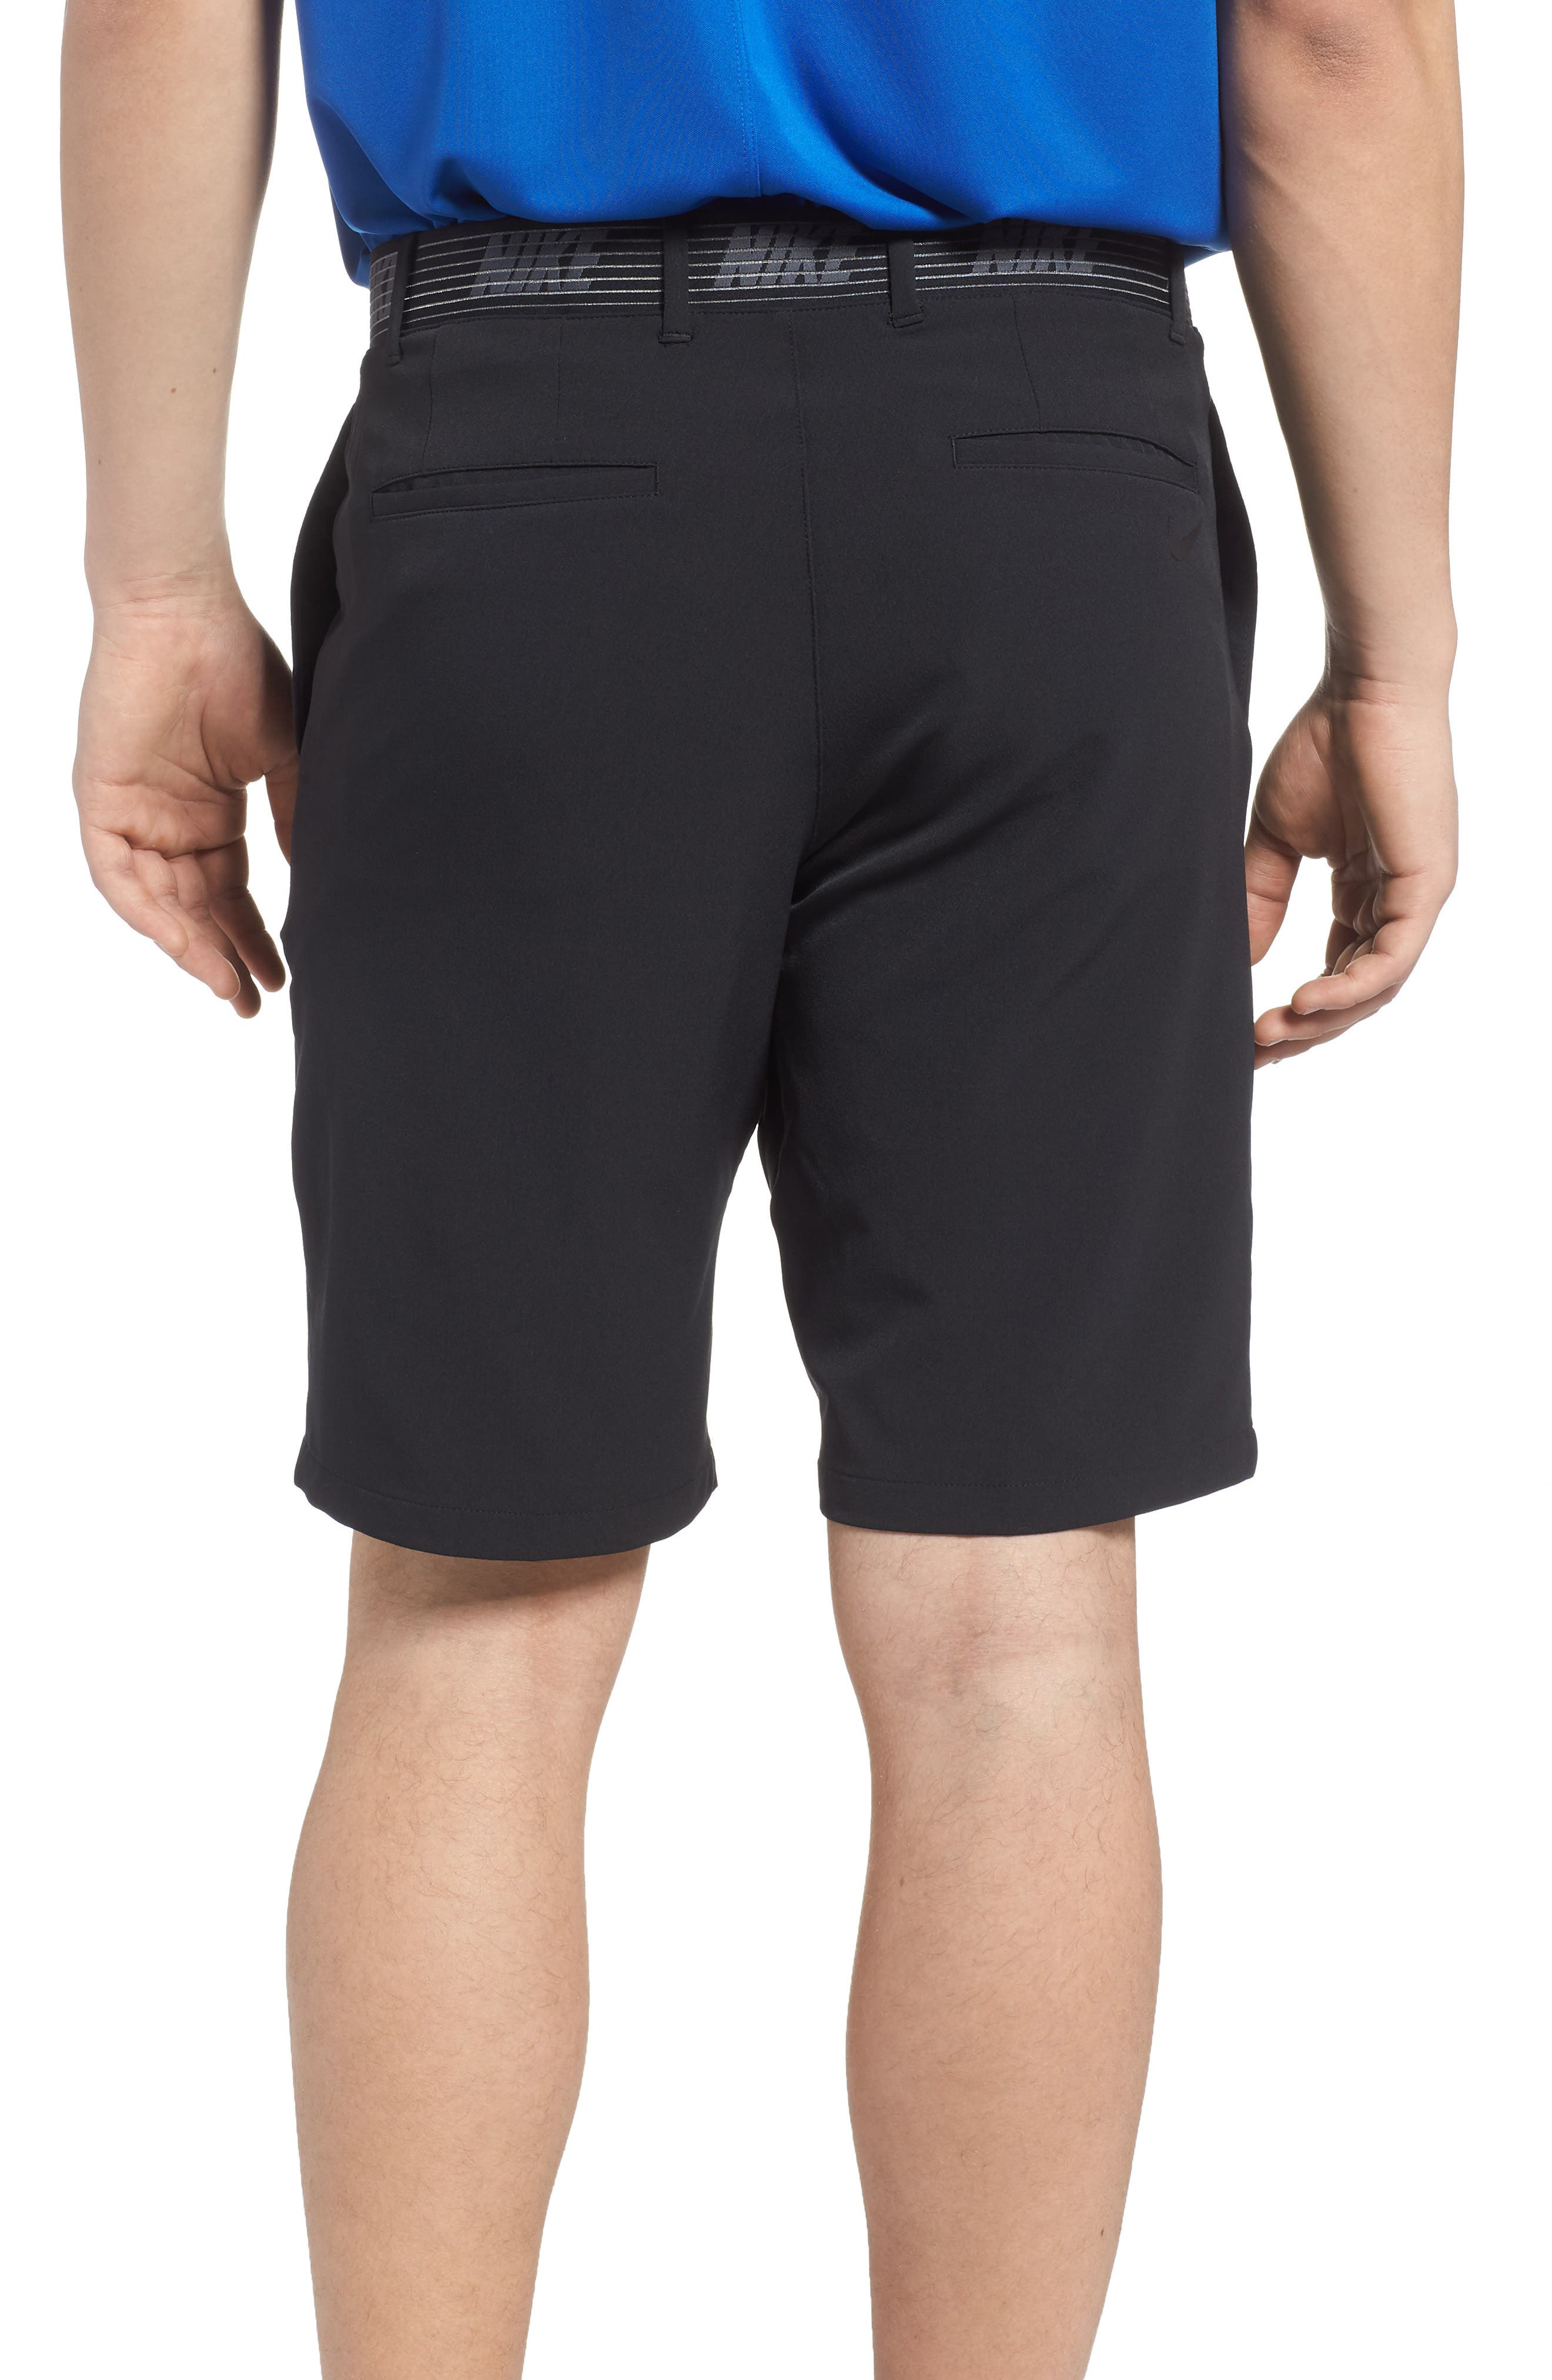 Dry Flex Slim Fit Golf Shorts,                             Alternate thumbnail 2, color,                             Black/ Black